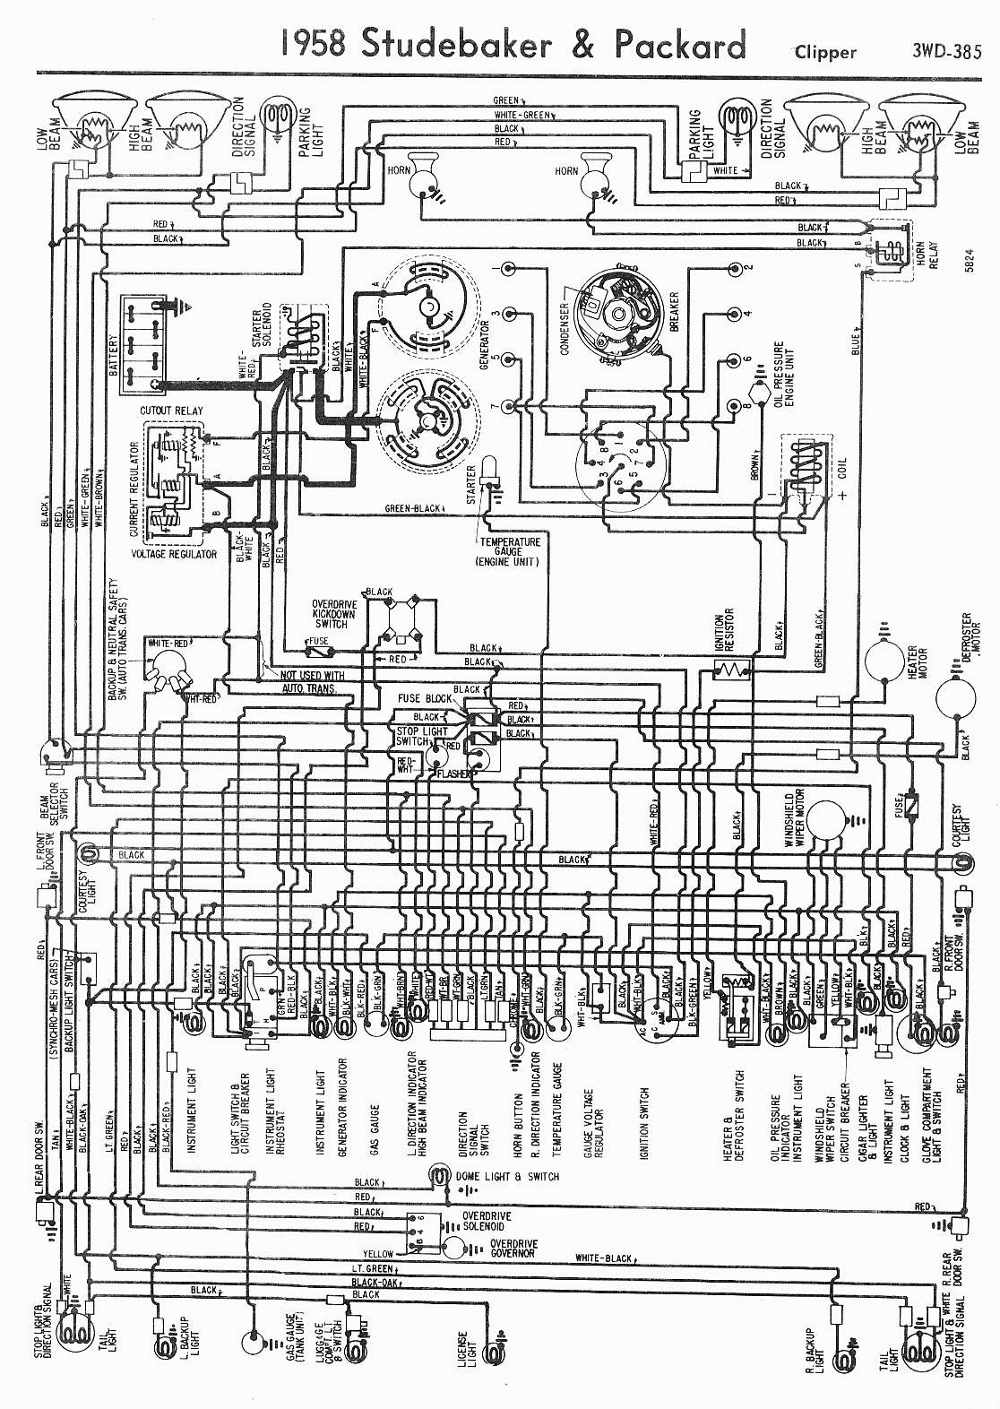 battery wiring diagram for ez go 1999 isuzu rodeo radio diagrams 911: december 2011